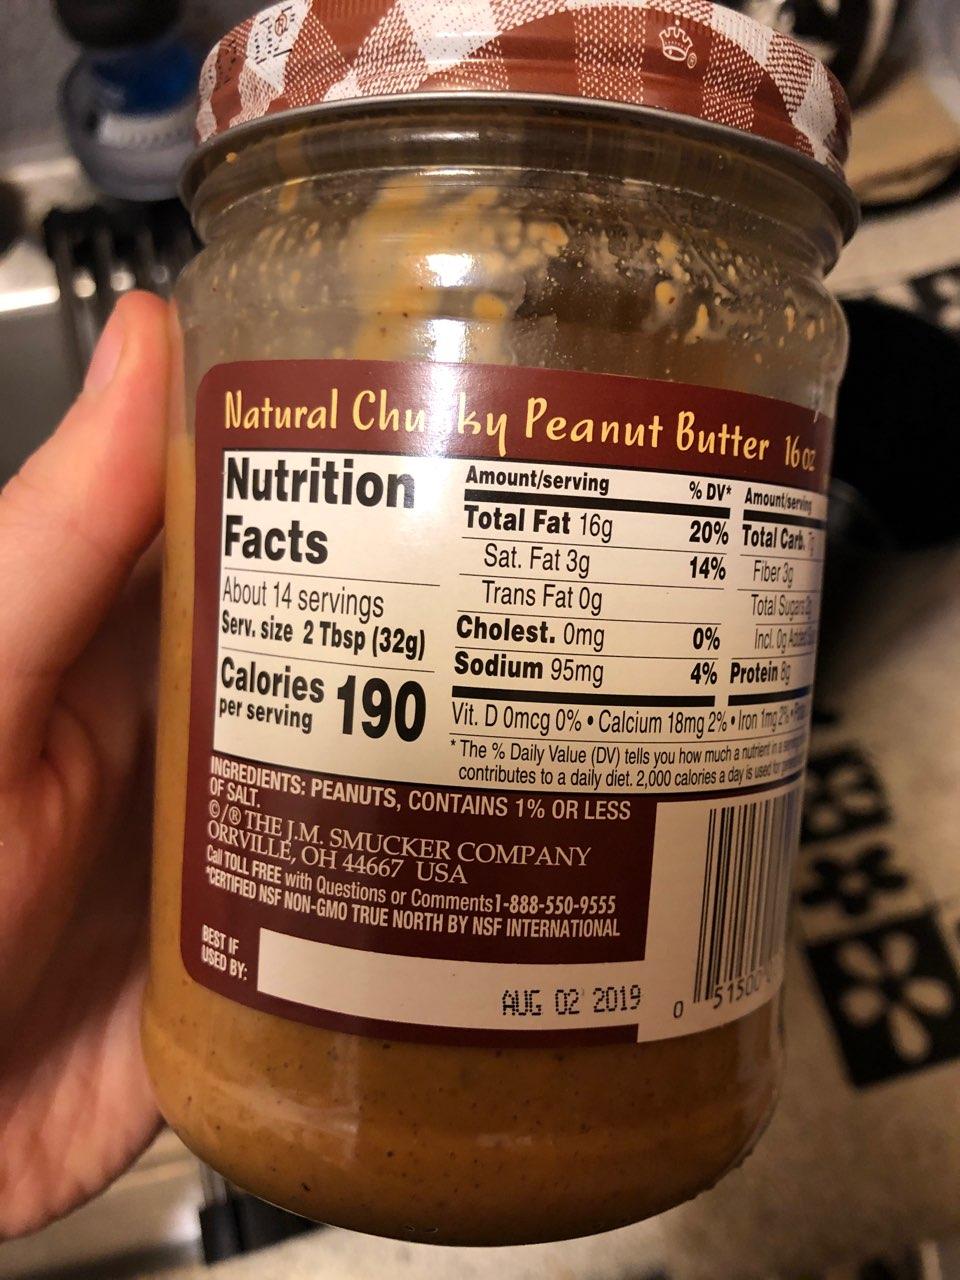 Smucker's Peanut Butter, Natural